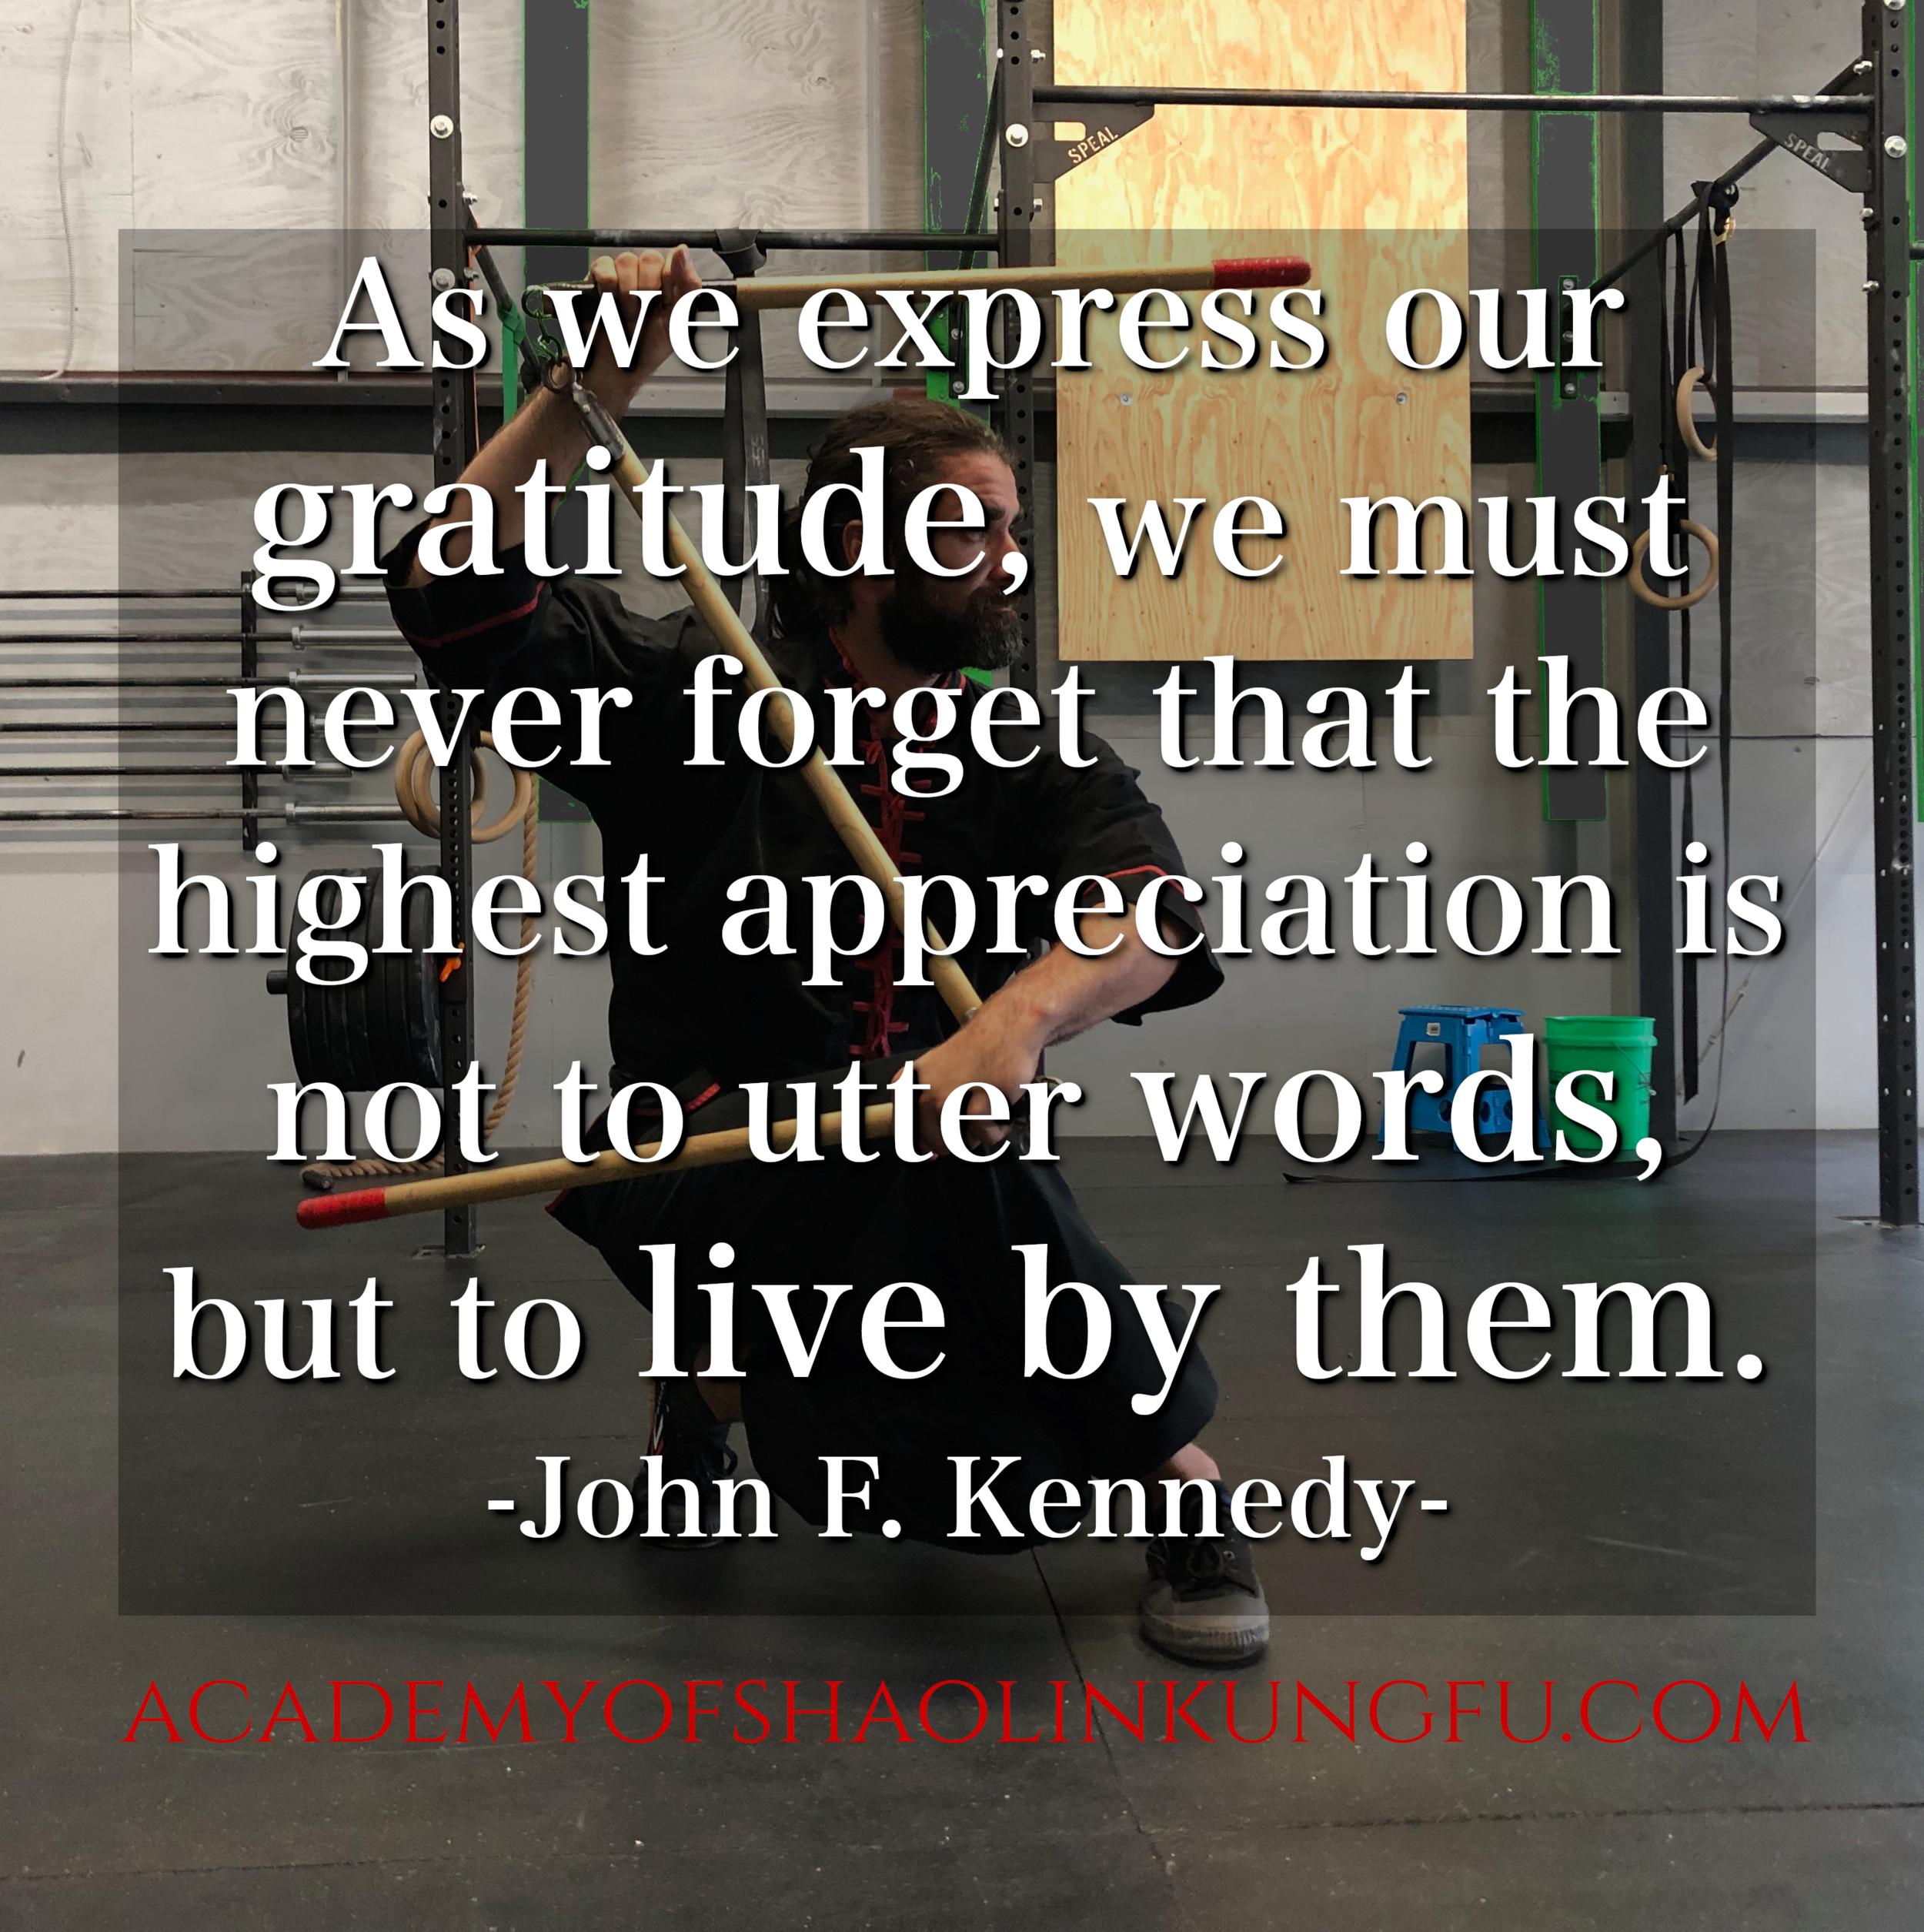 John F Kennedy.png